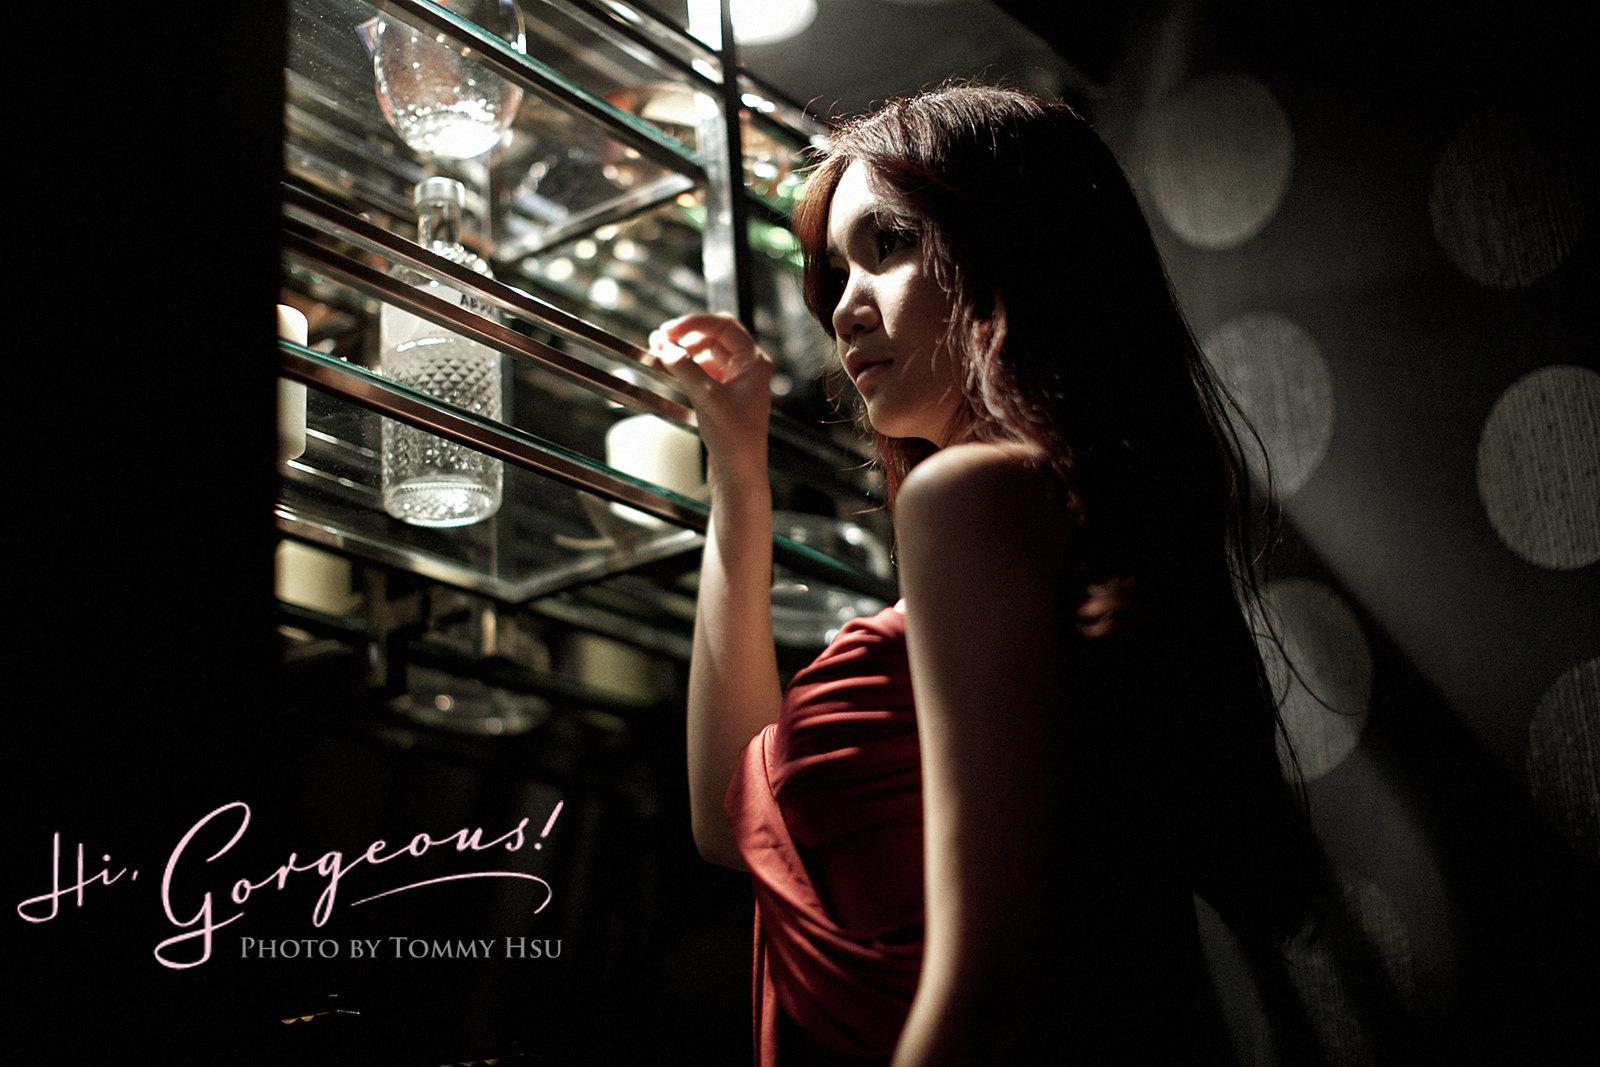 2011.10.7 Cherish Sky lounge